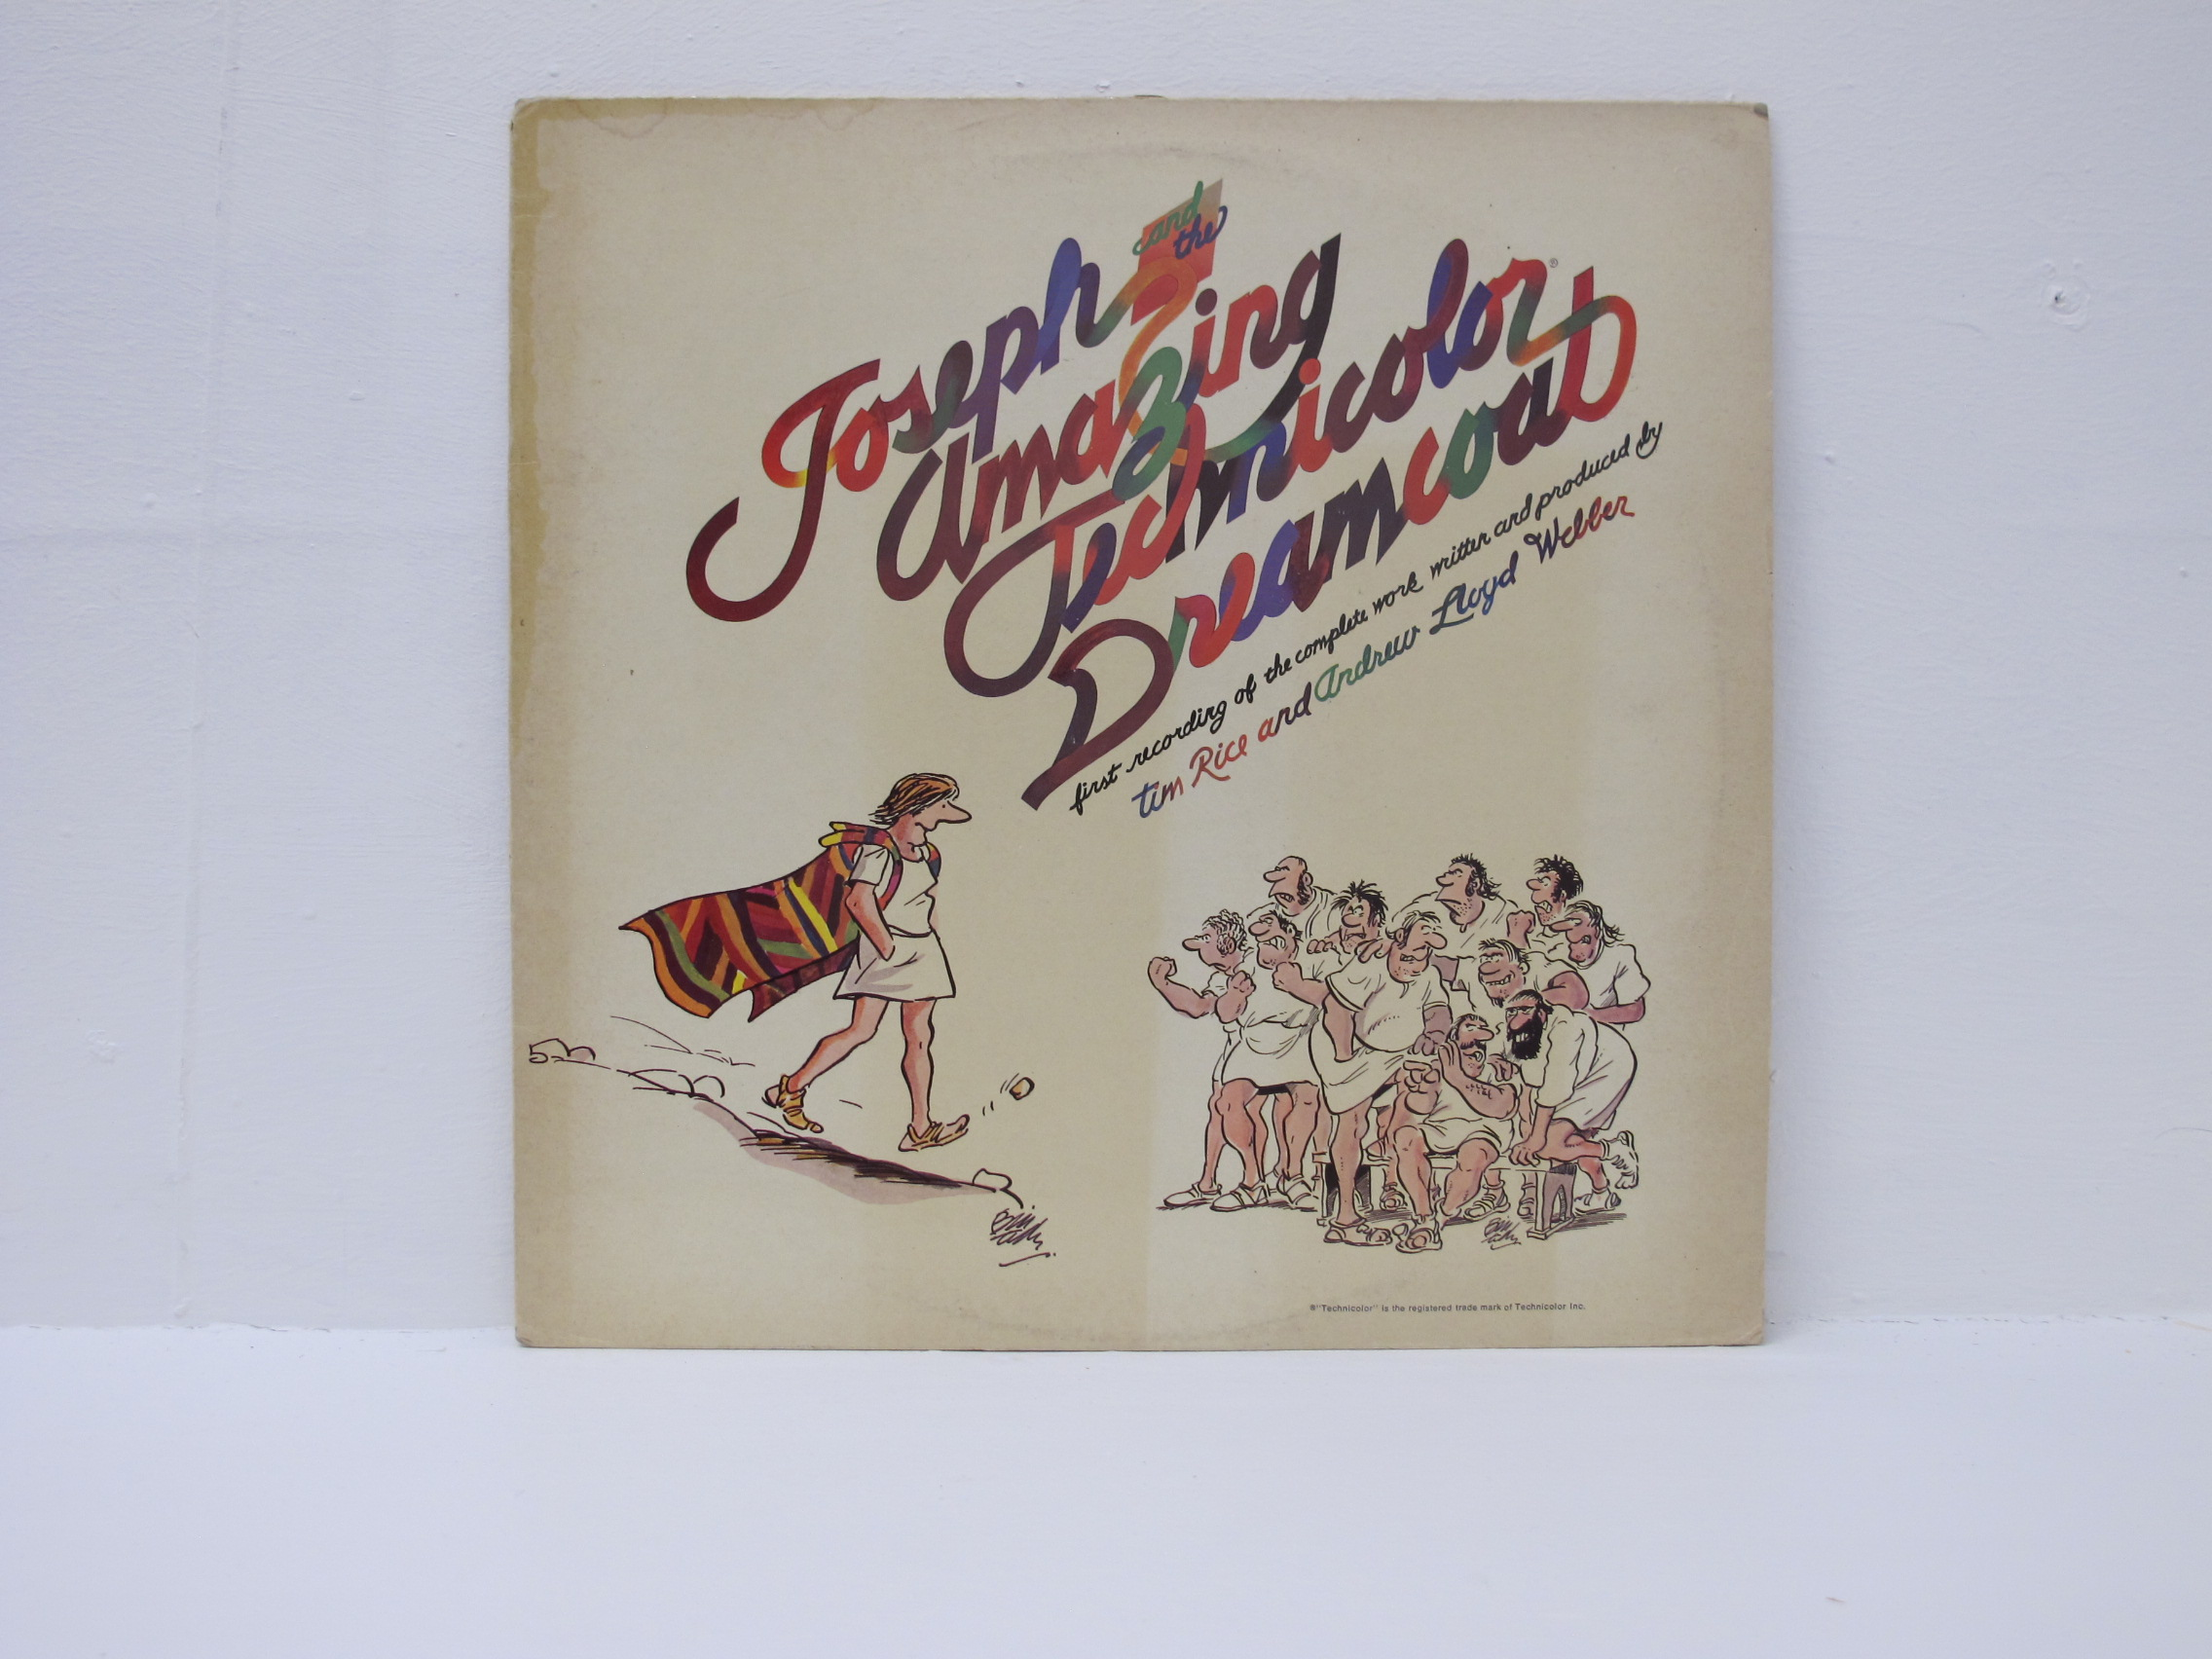 Andrew Lloyd Webber & Tim Rice - Joseph And The Amazing Technicolour Dreamcoat